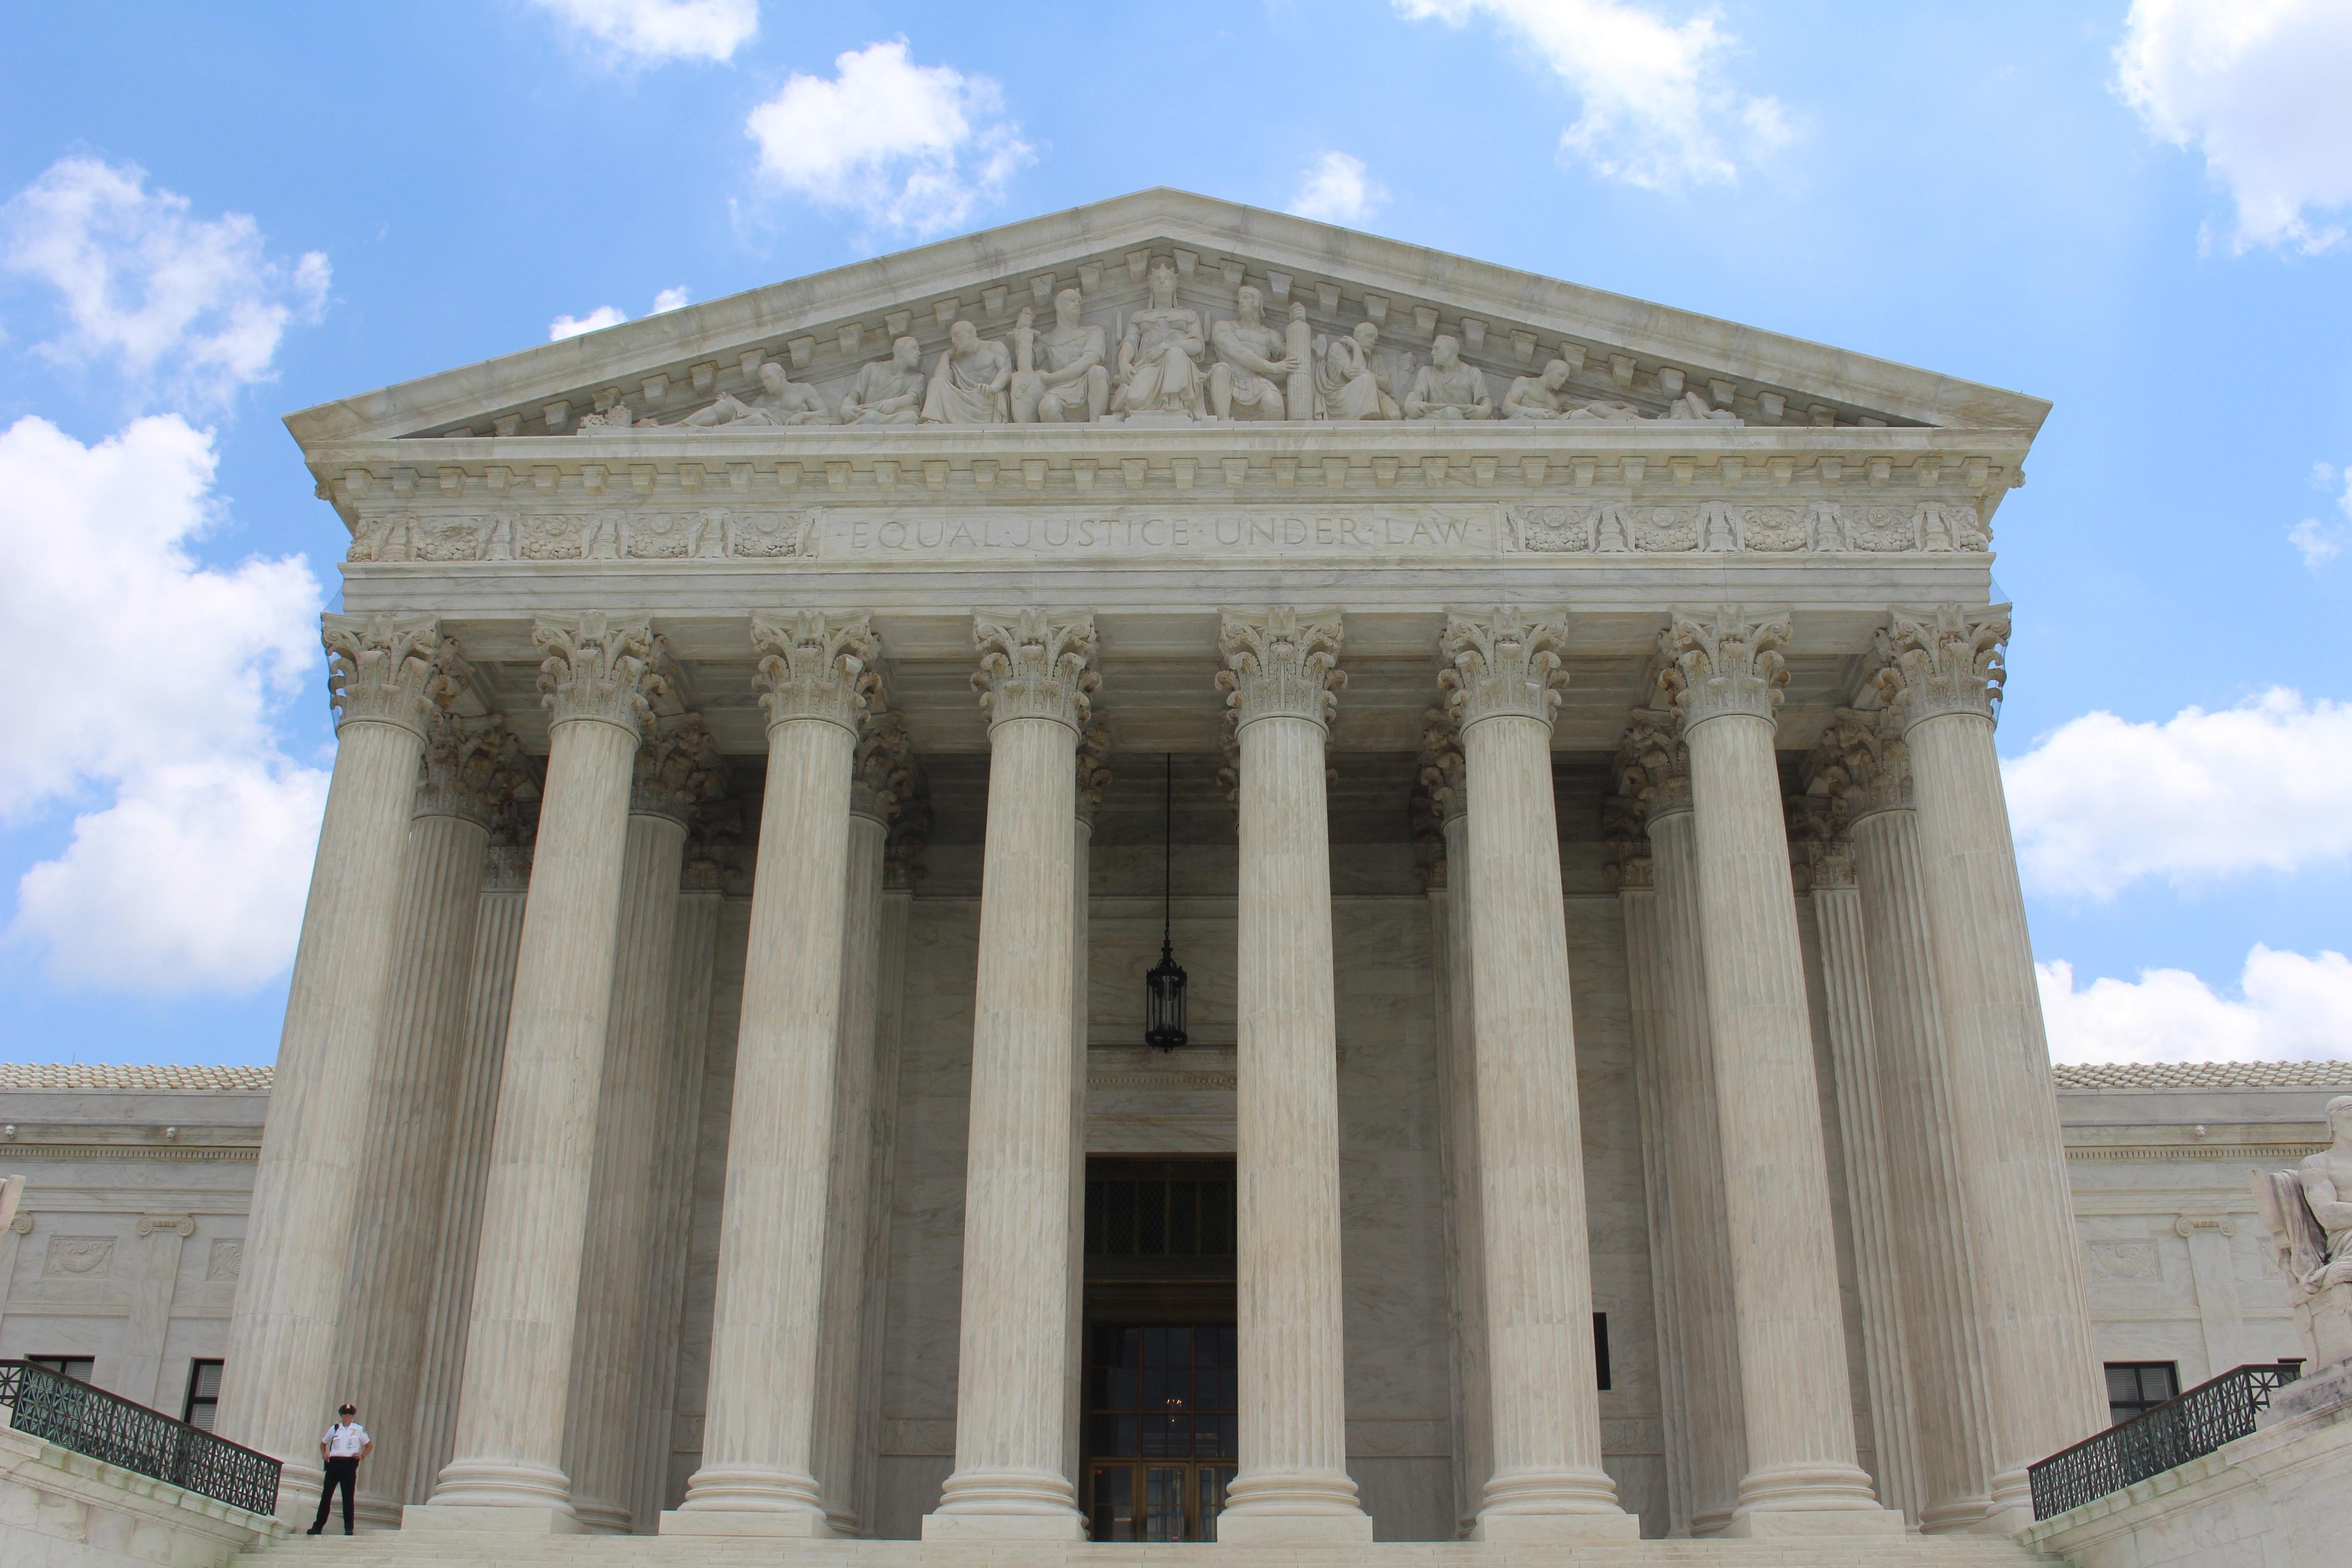 United States Supreme Court building. Photo courtesy of Claire Anderson via Unsplash.